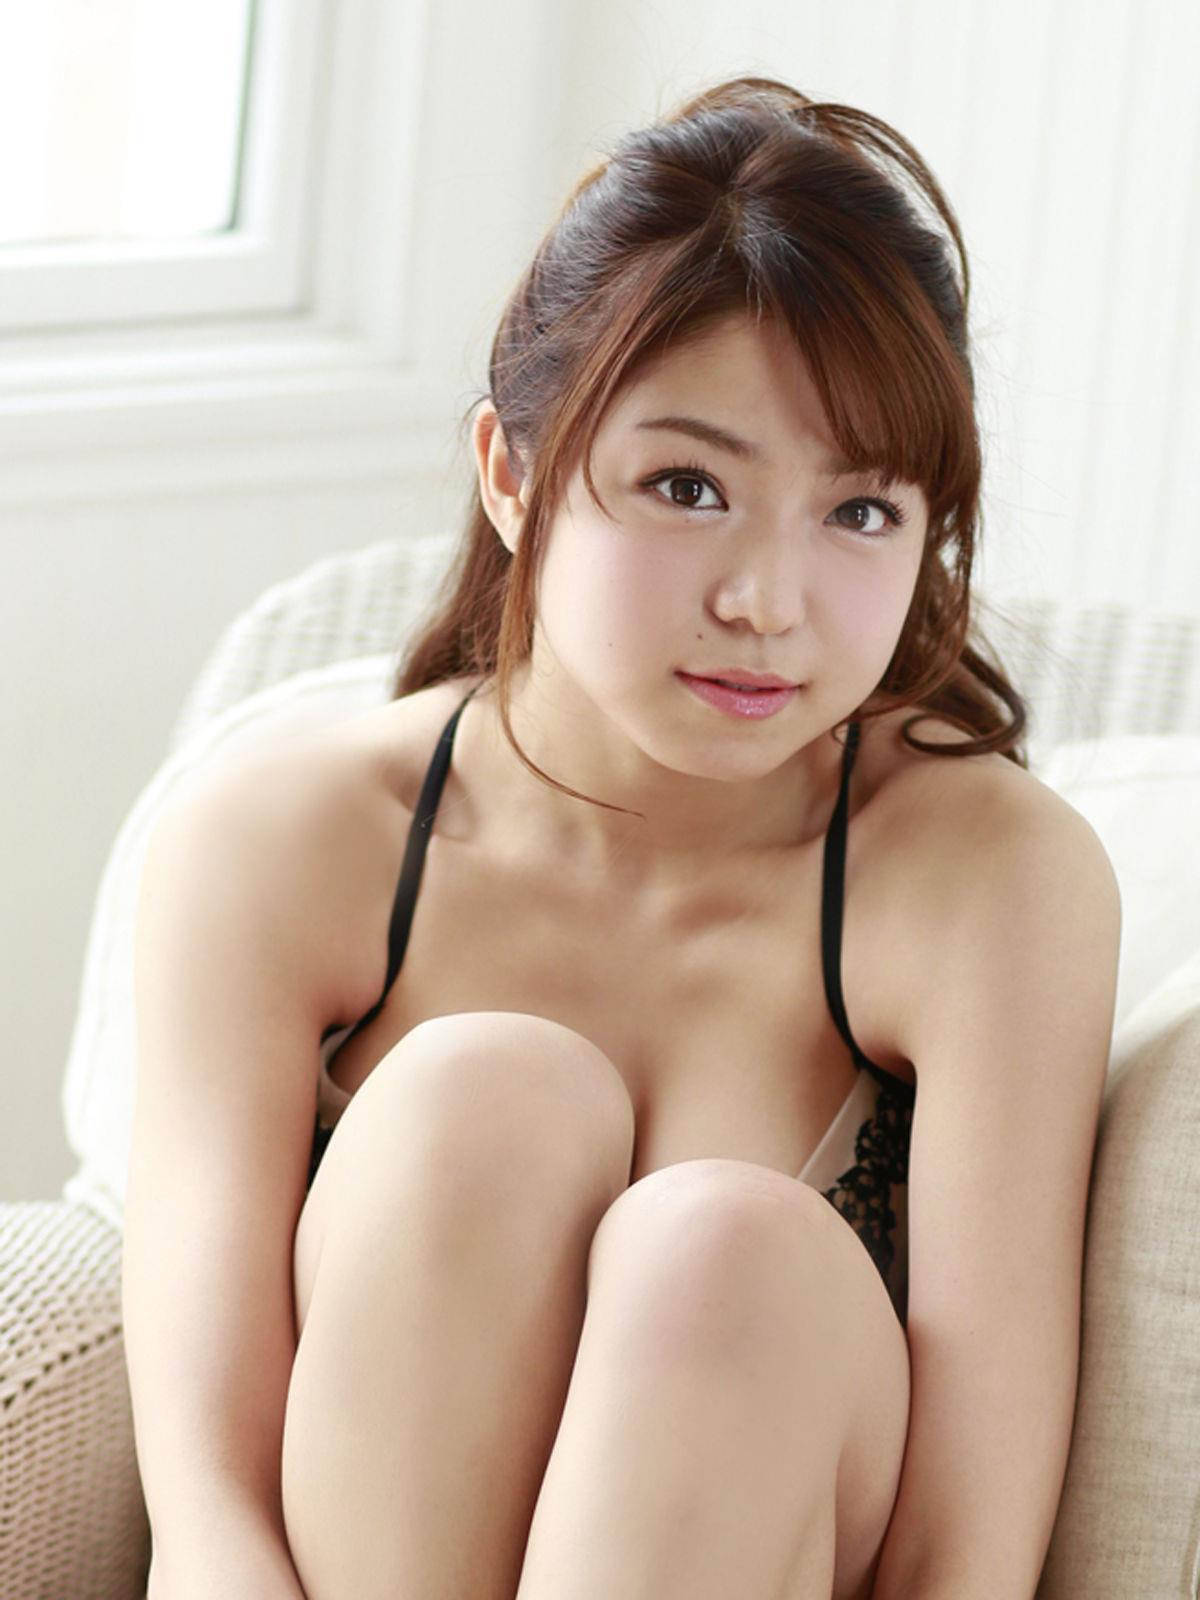 中村静香 画像 45